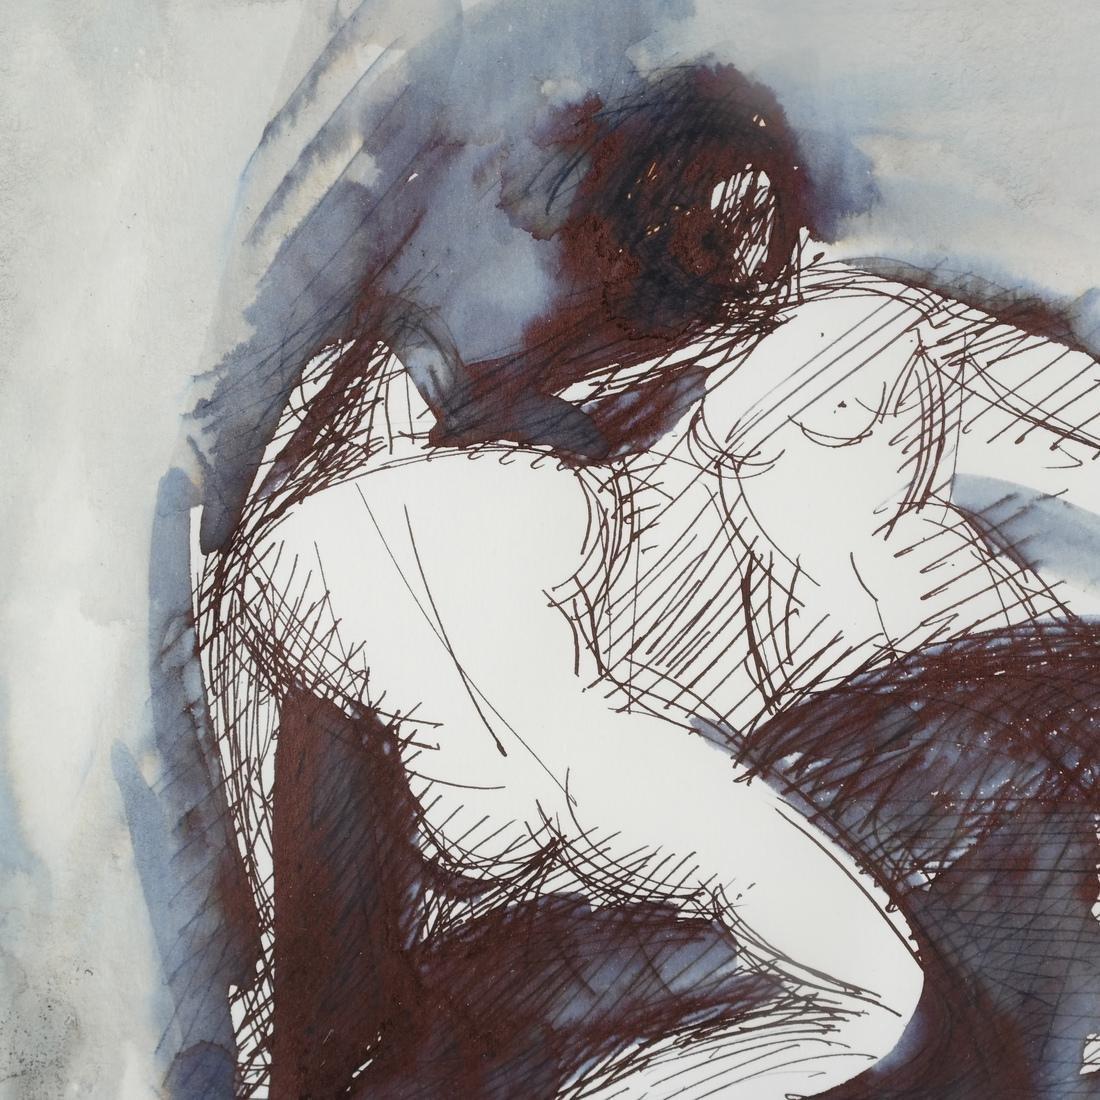 Dora Maar Abstract Painting - 3